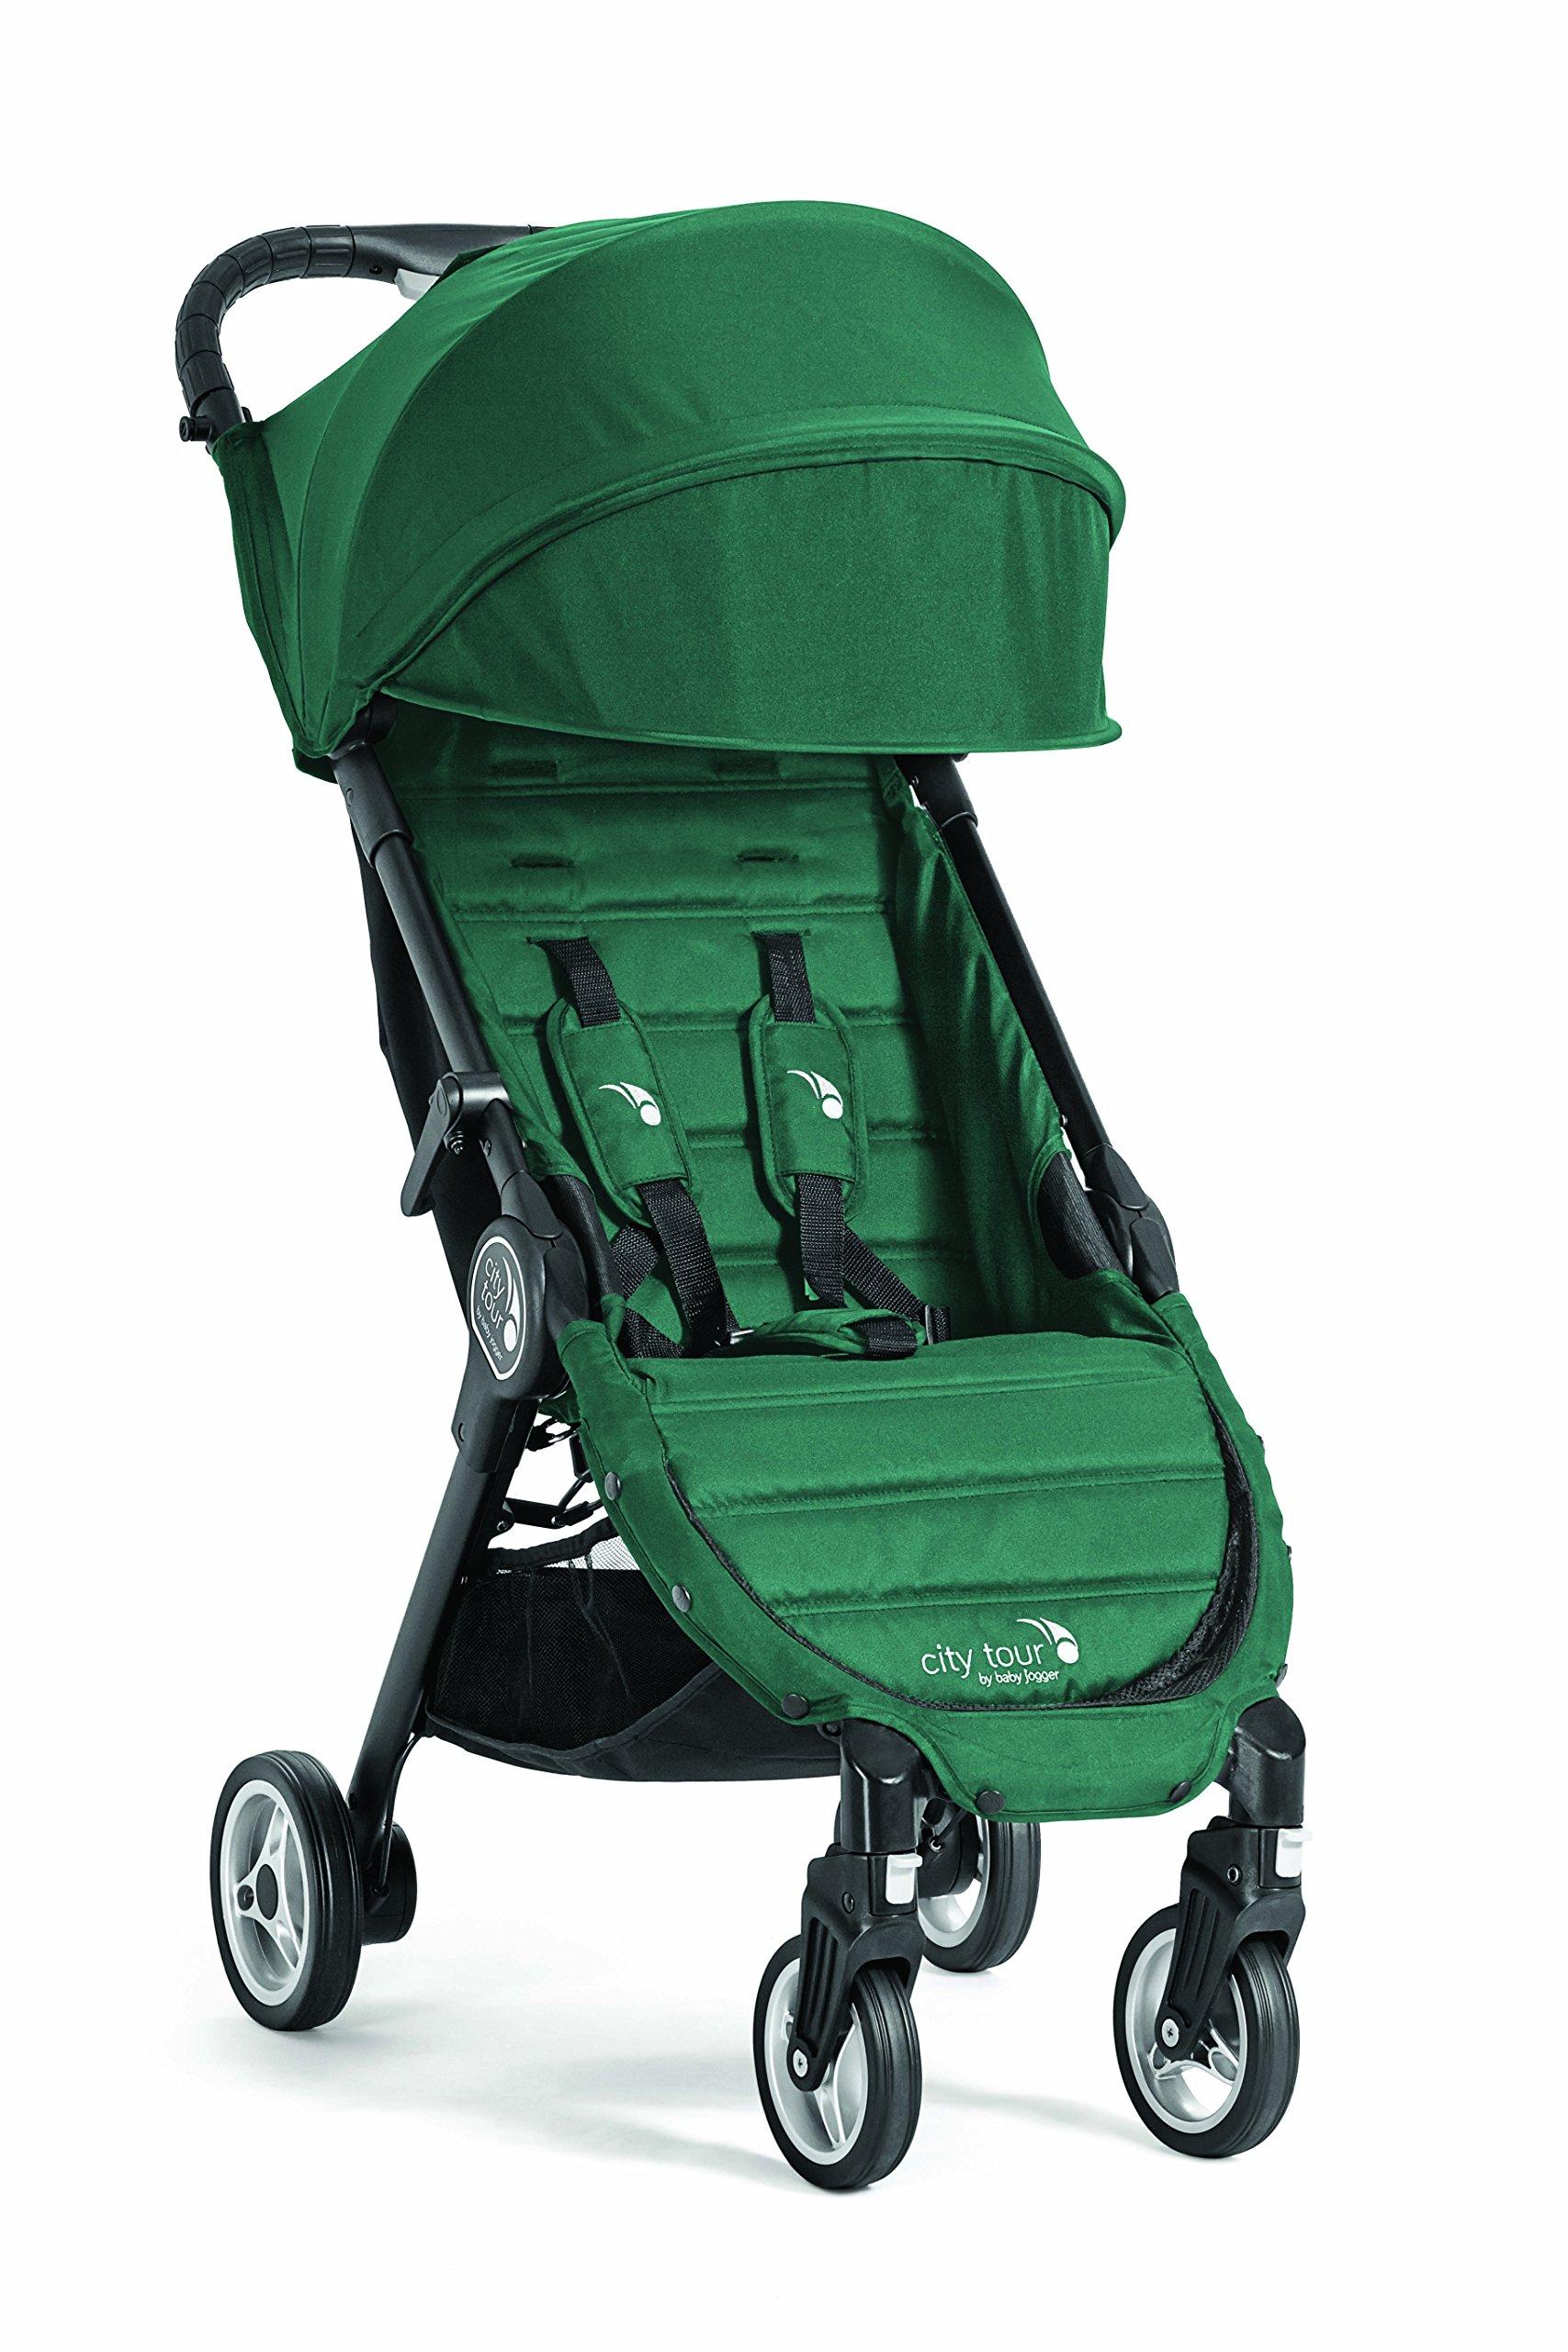 Baby Jogger City Tour stroller, Juniper